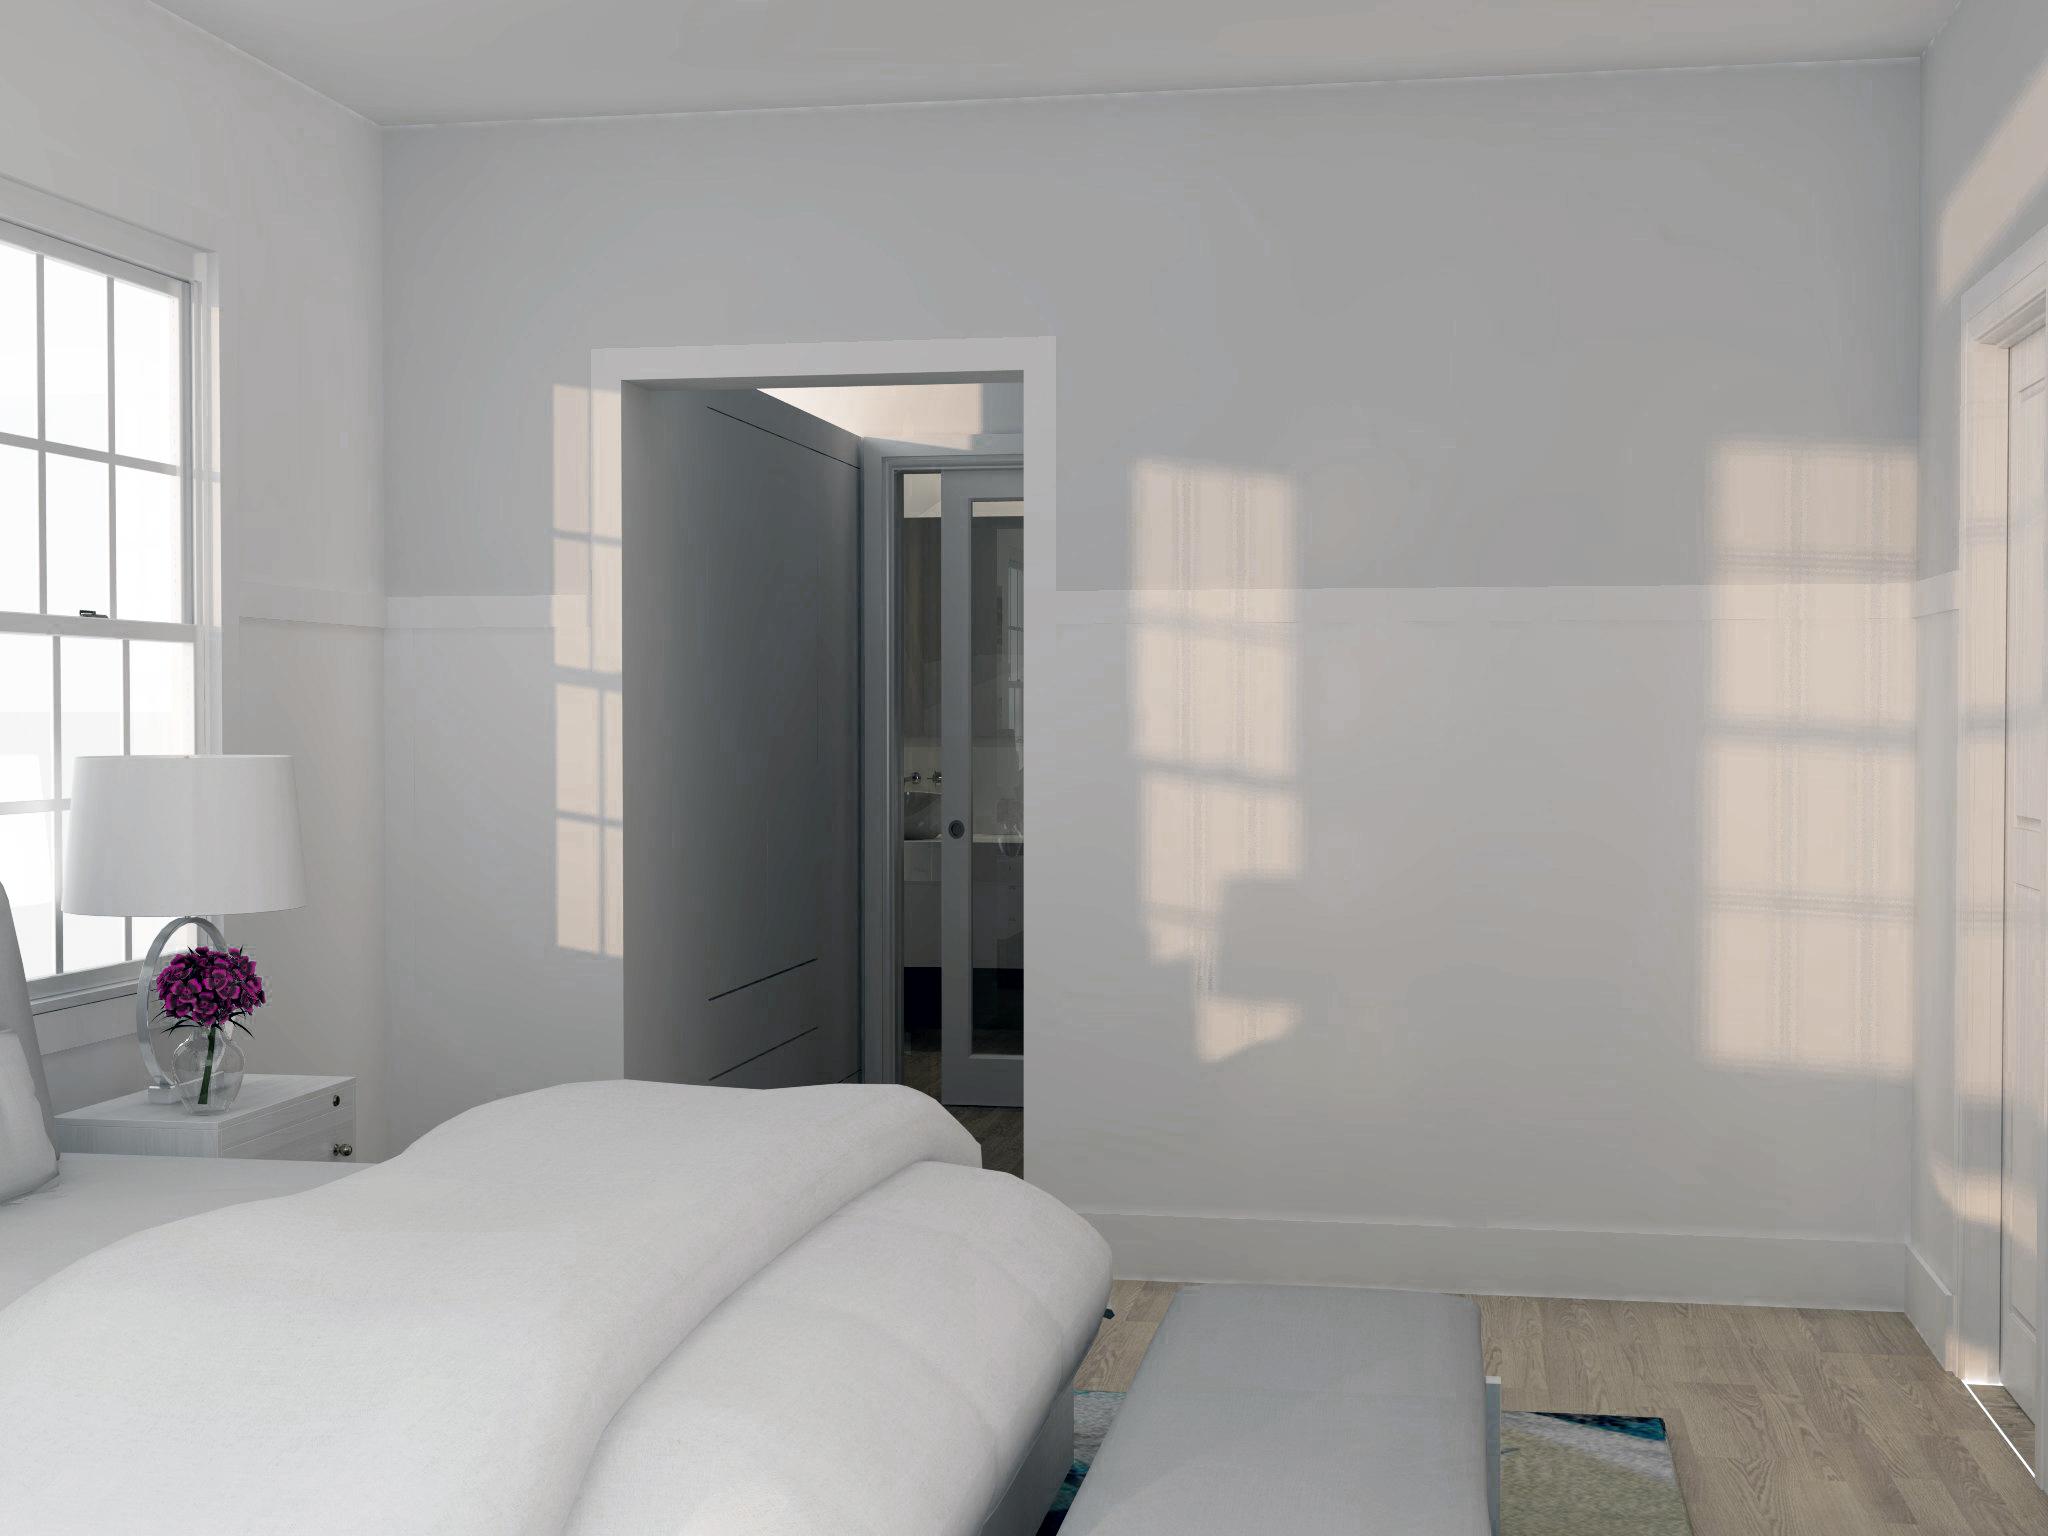 vancouver interior designer rendering digital